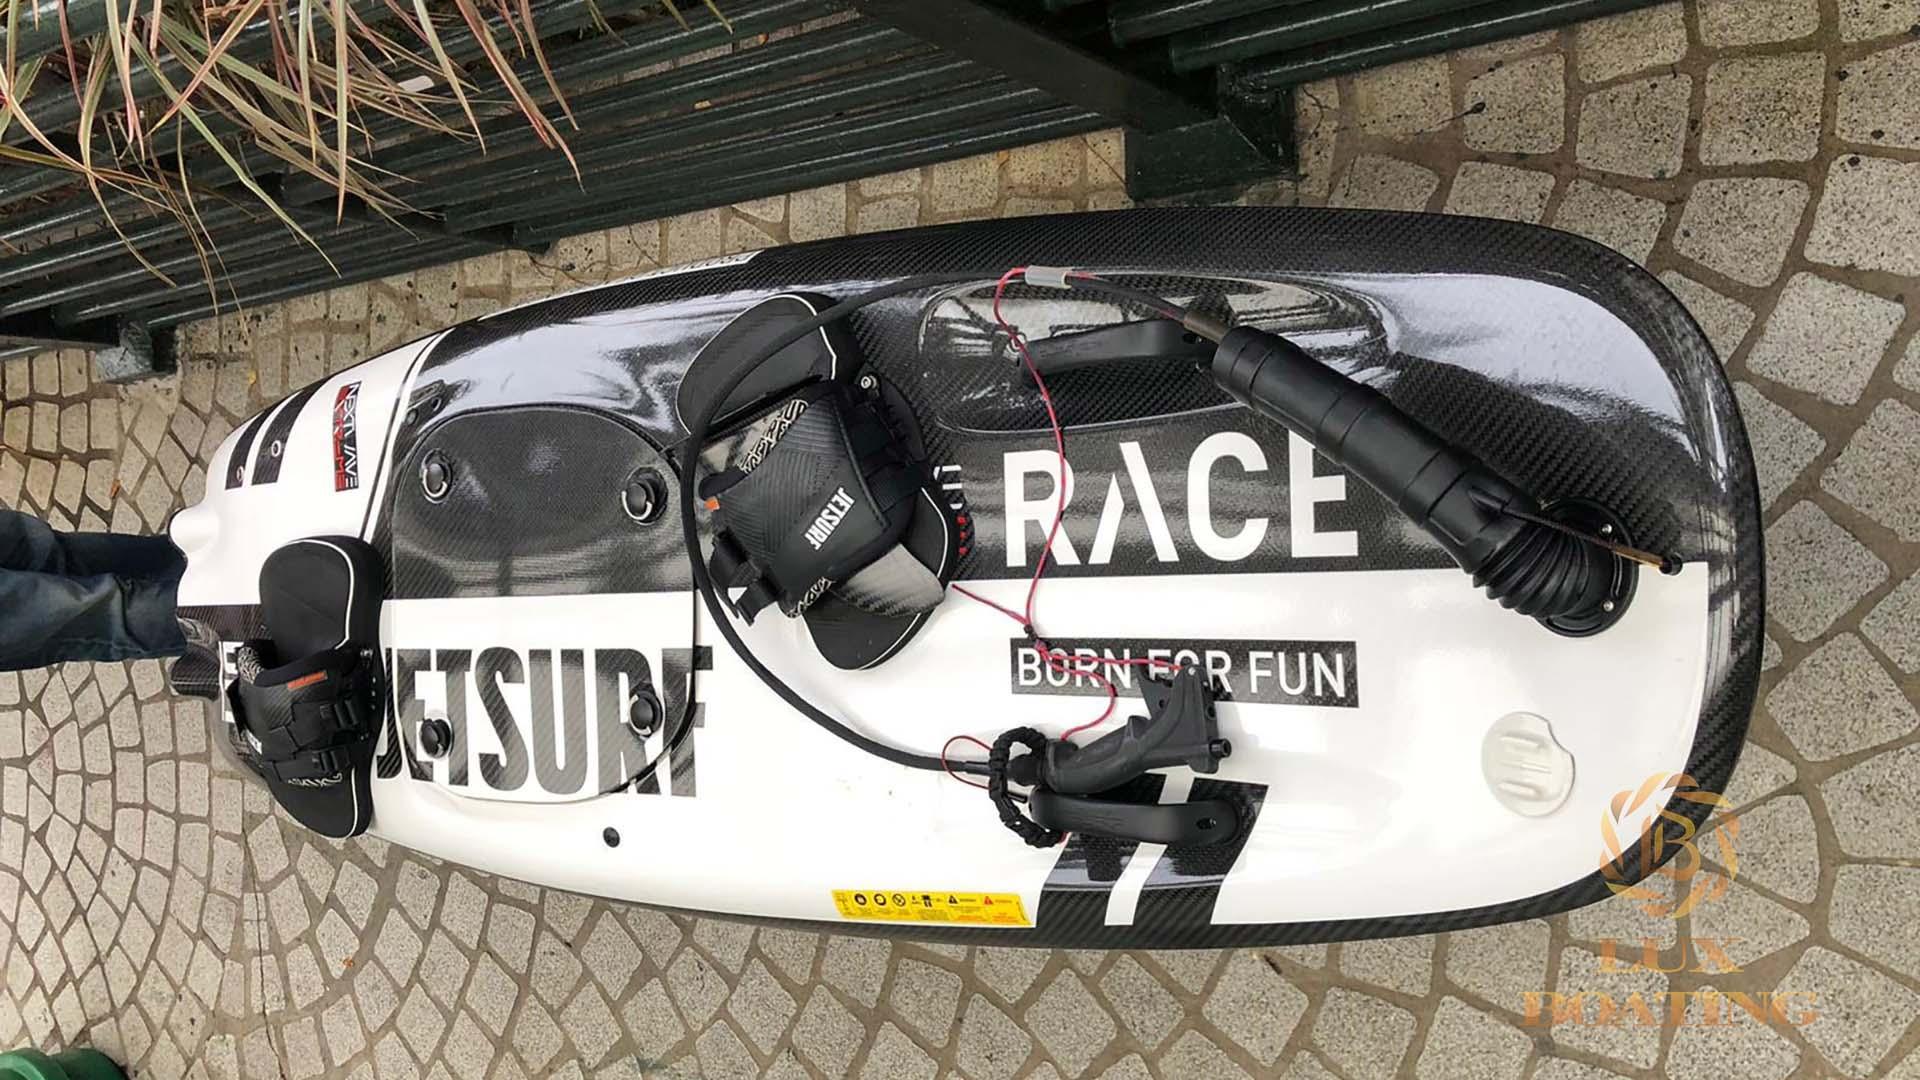 2019 JETSURF RACE WHITE